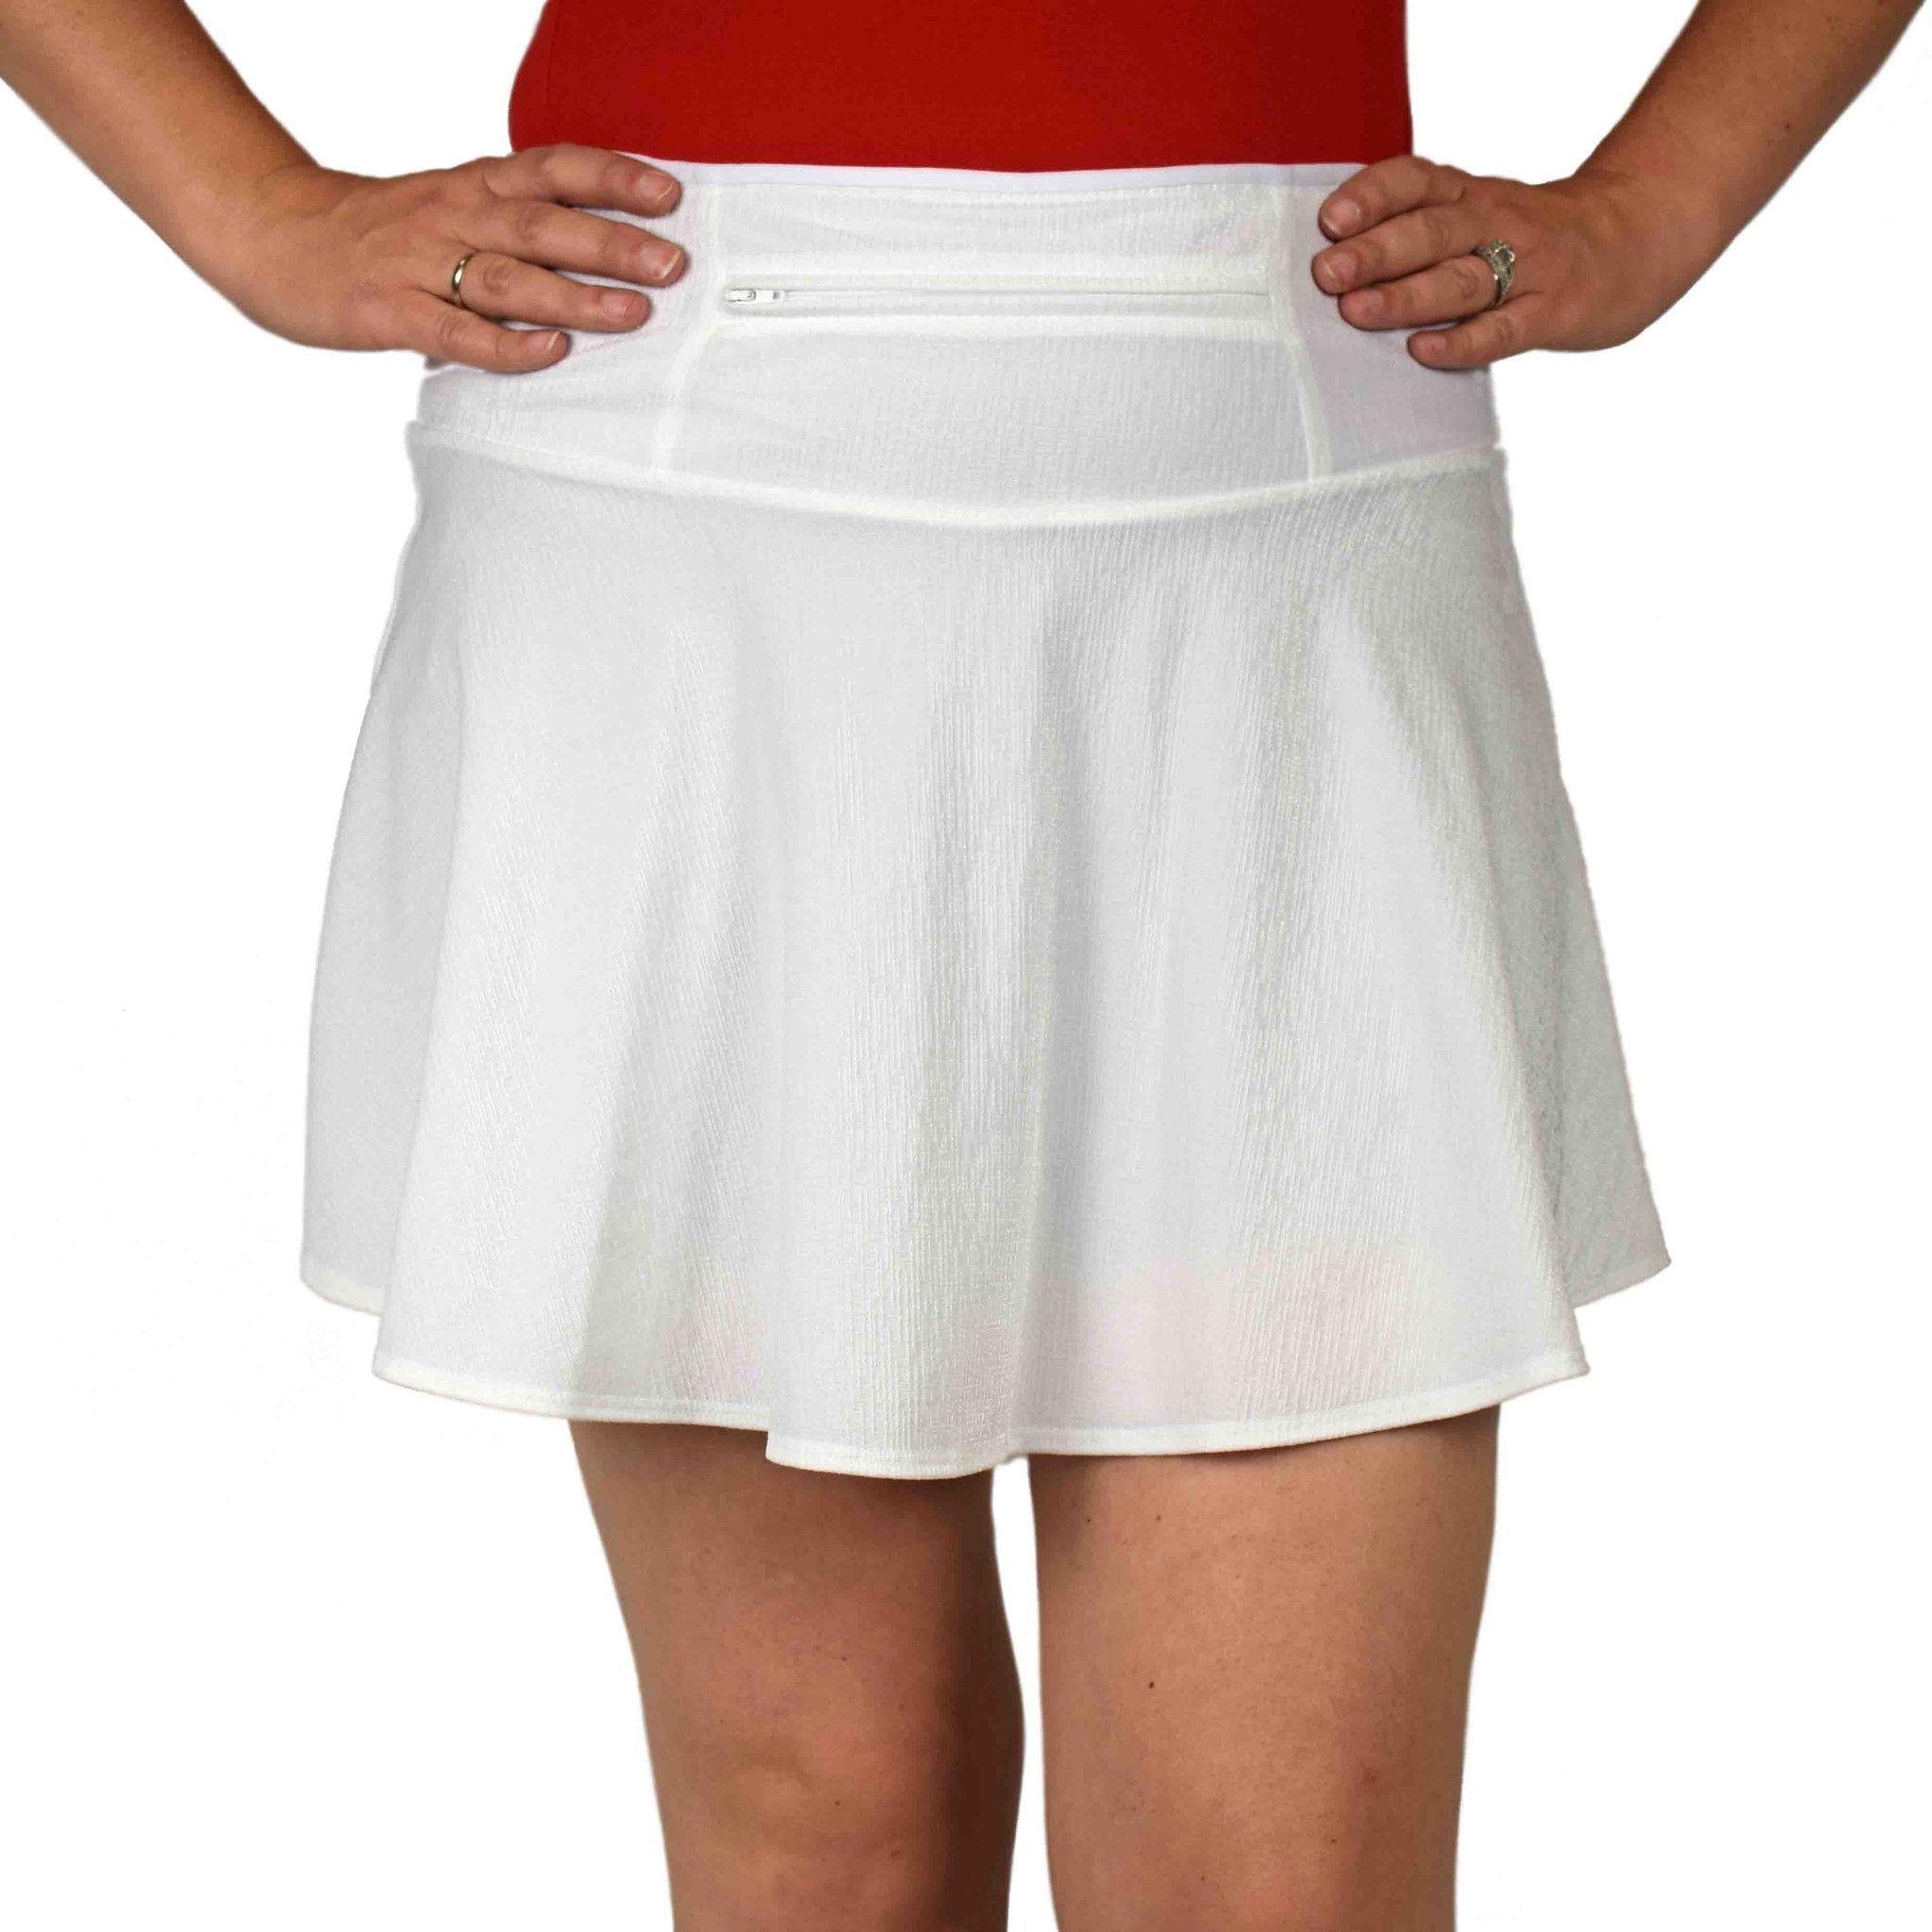 WhiteLinen Swing Style- XXS | Products | Running skirts